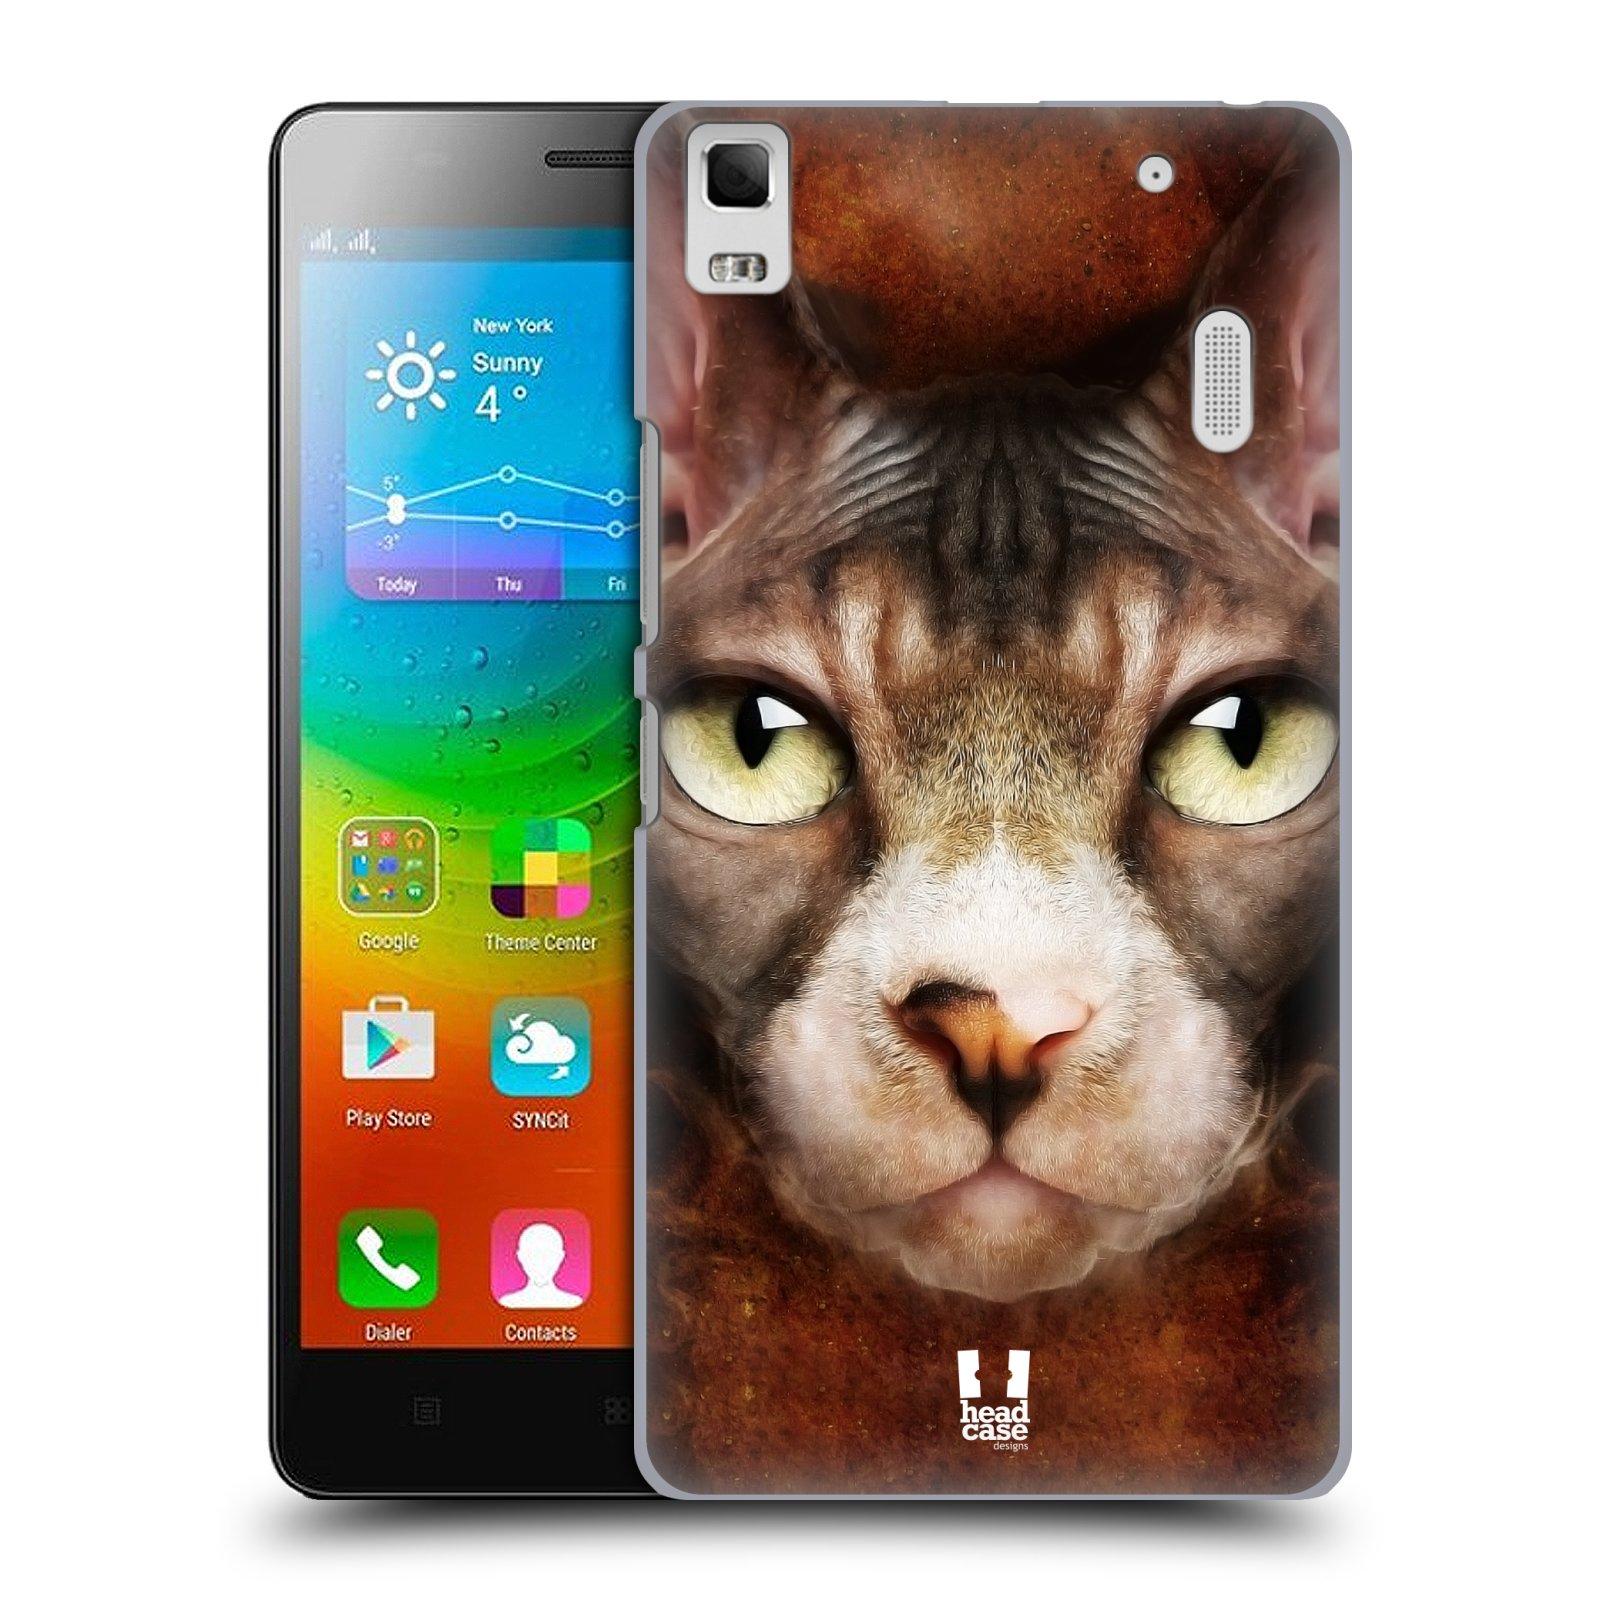 HEAD CASE pevný plastový obal na mobil LENOVO A7000 / A7000 DUAL / K3 NOTE vzor Zvířecí tváře kočka sphynx